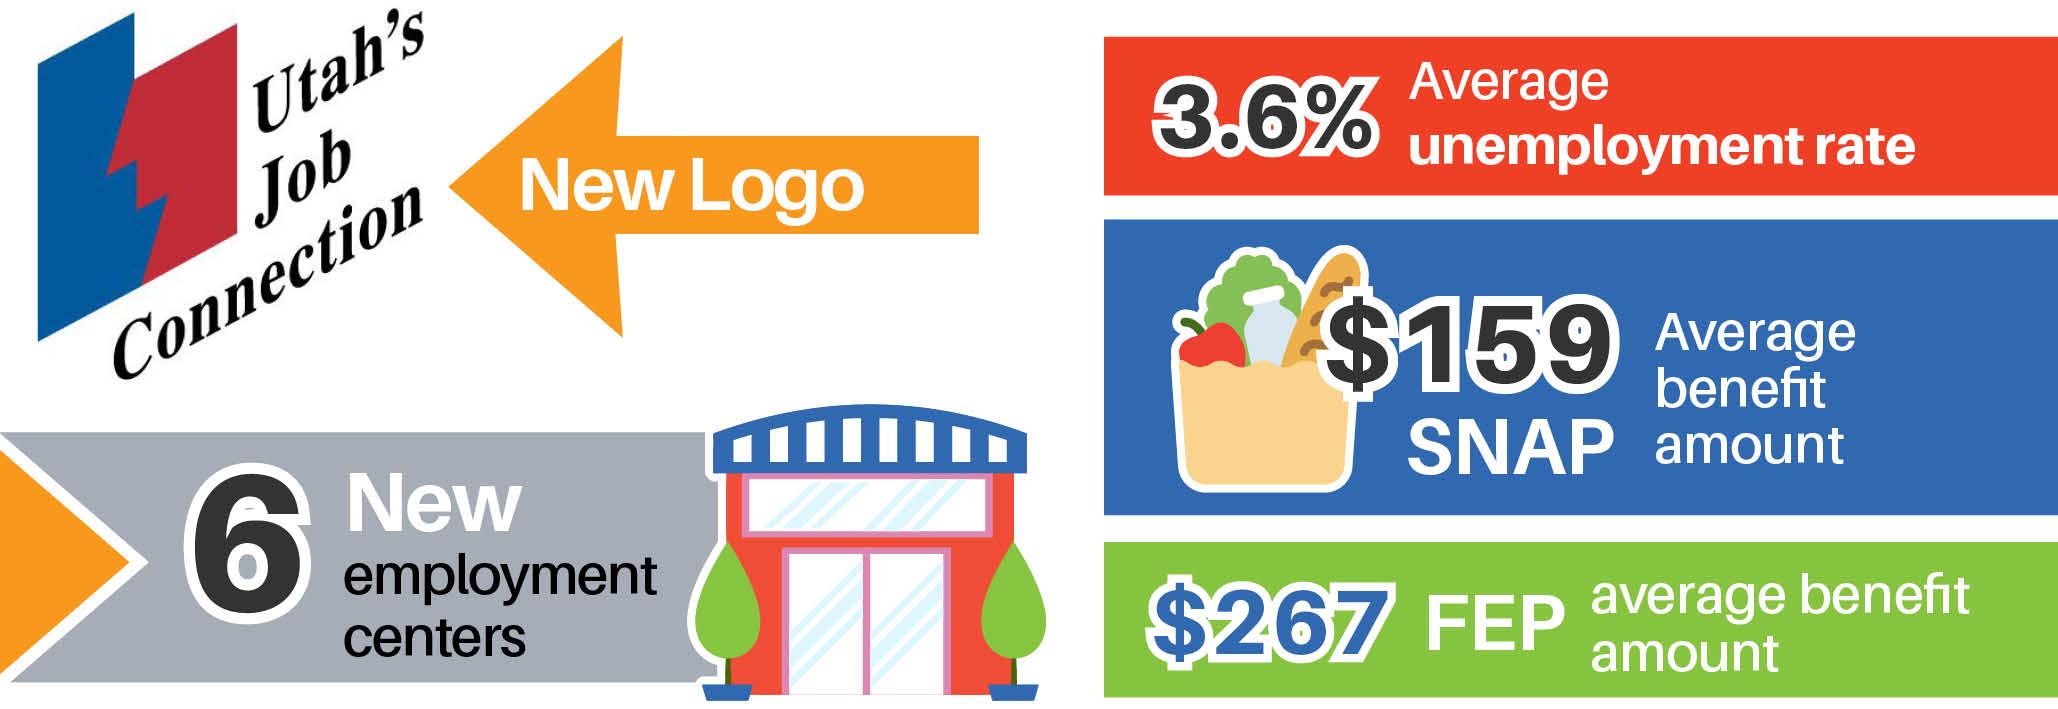 New Utah's Job Connection Logo. 6 New Employment Centers. 3.6% average unemployment rate. $159 SNAP average benefit amount. $267 FEP average benefit amount.